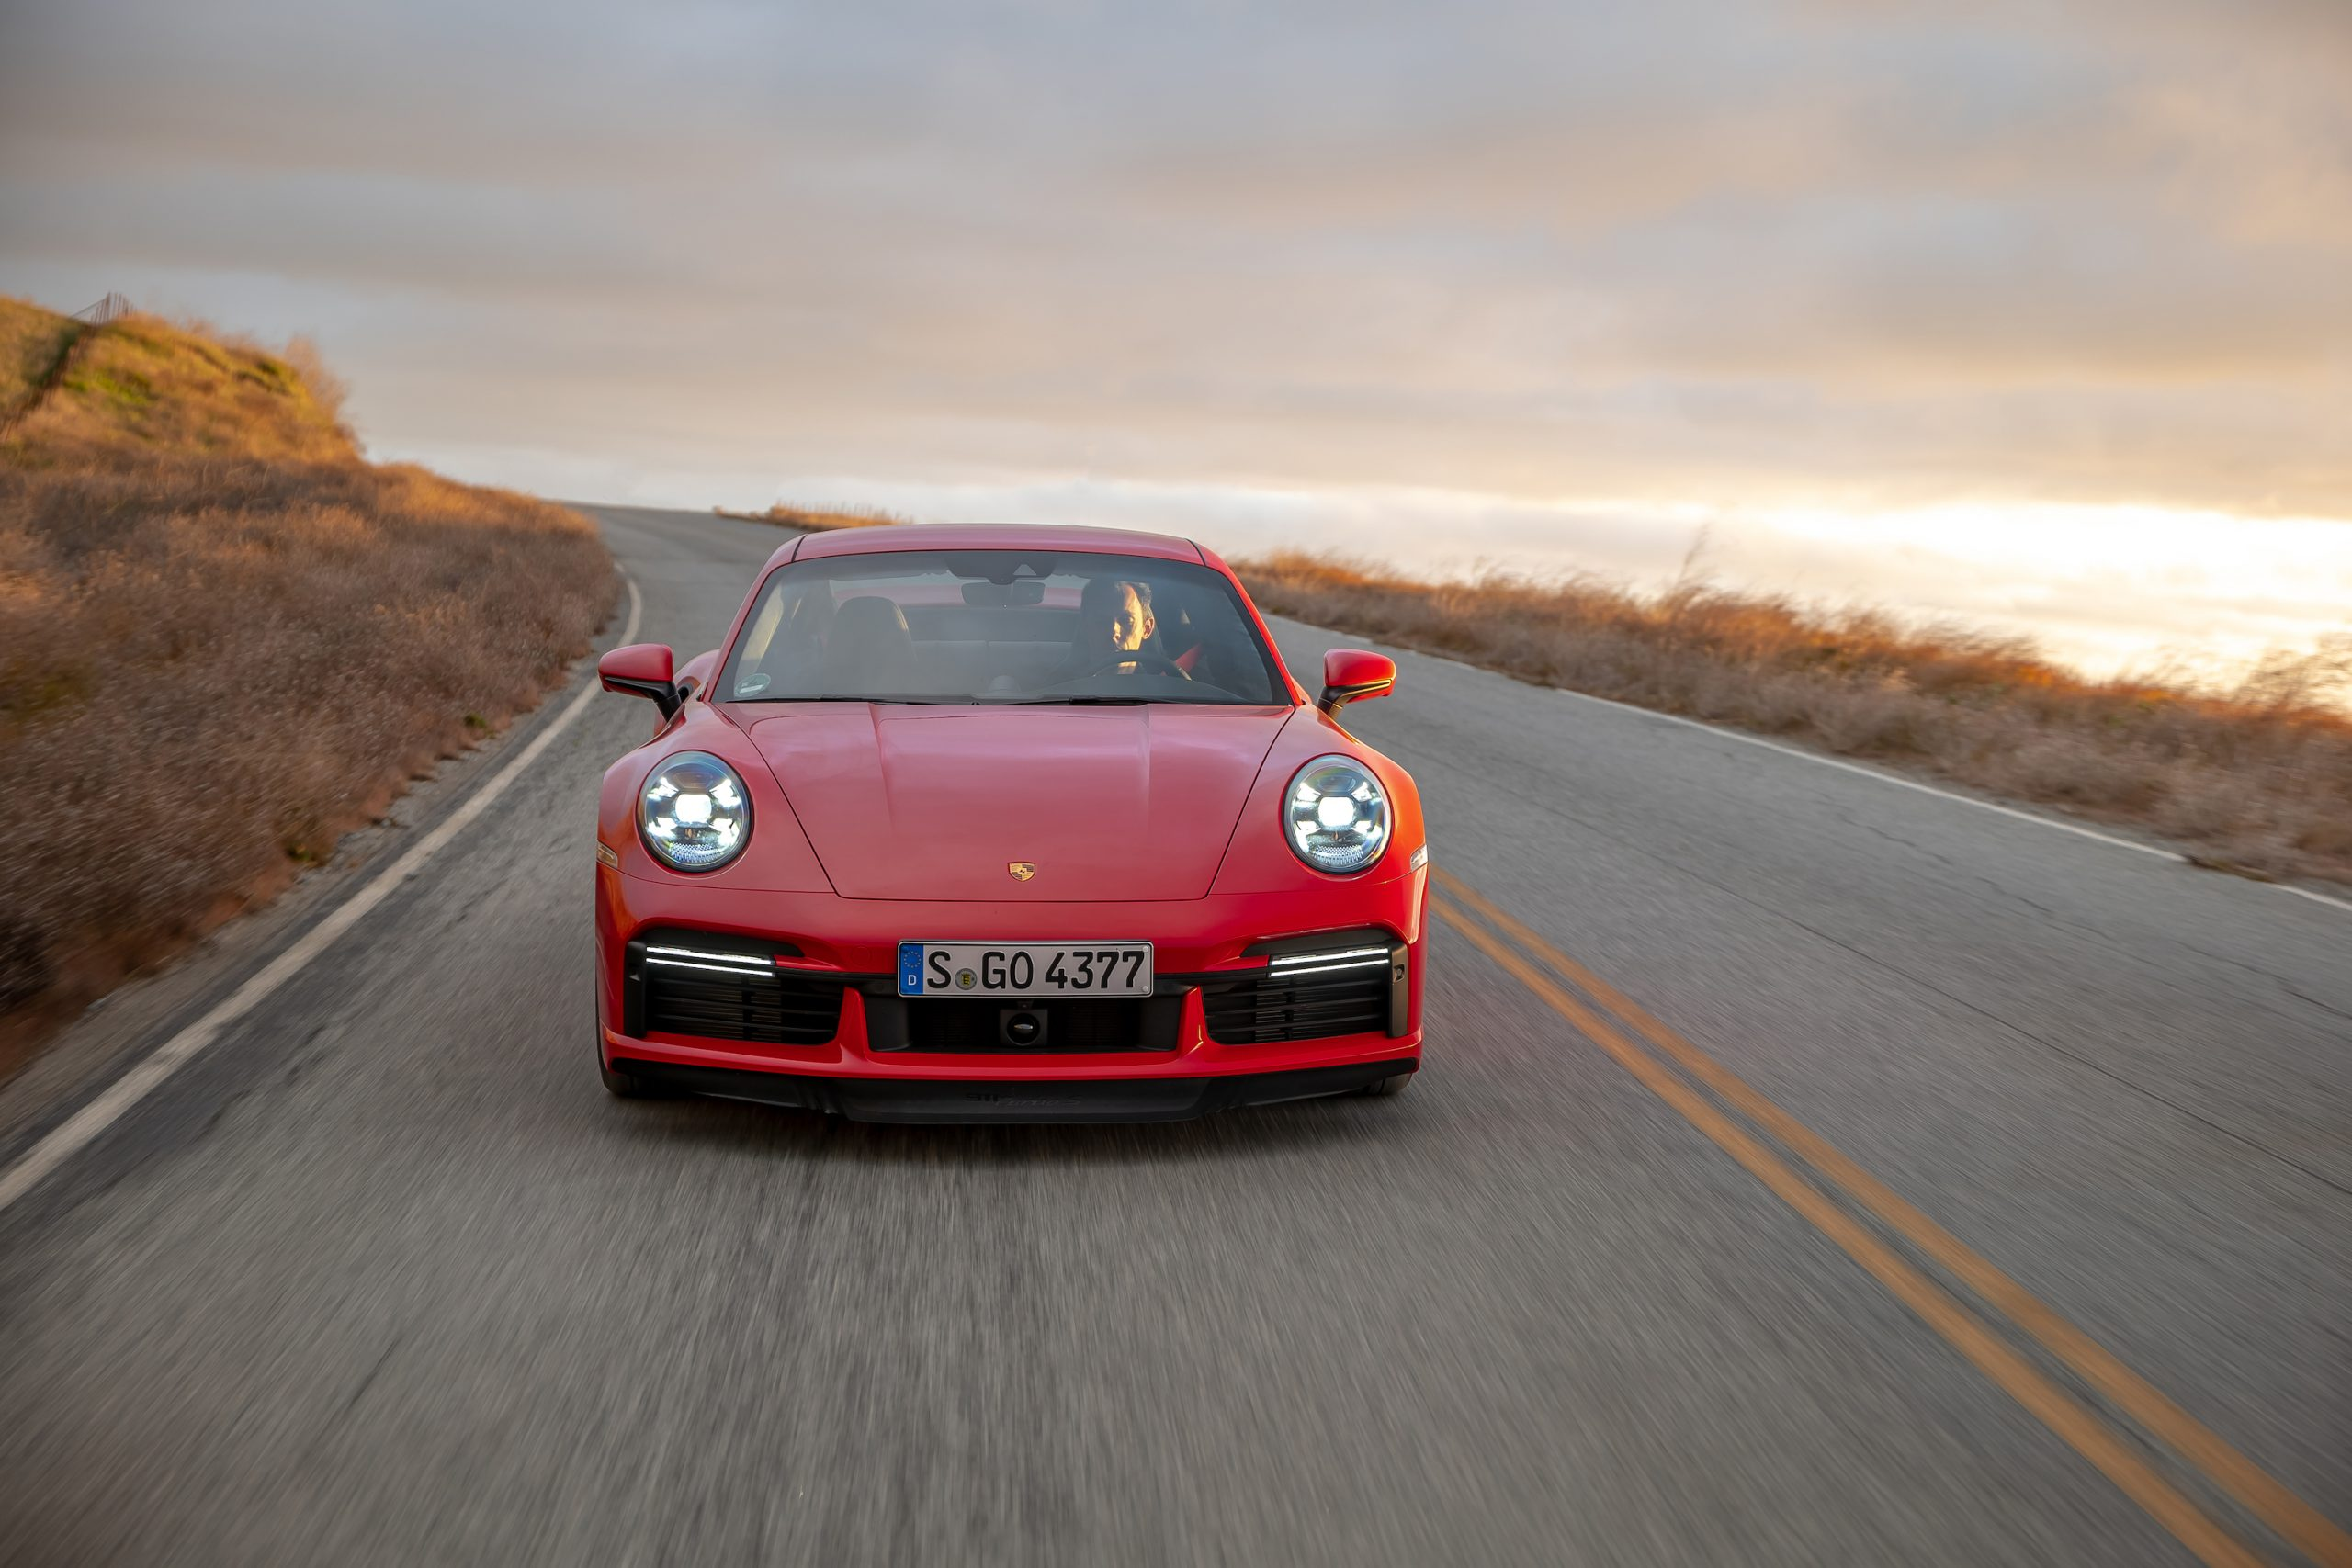 2021 Porsche 911 Turbo S Front